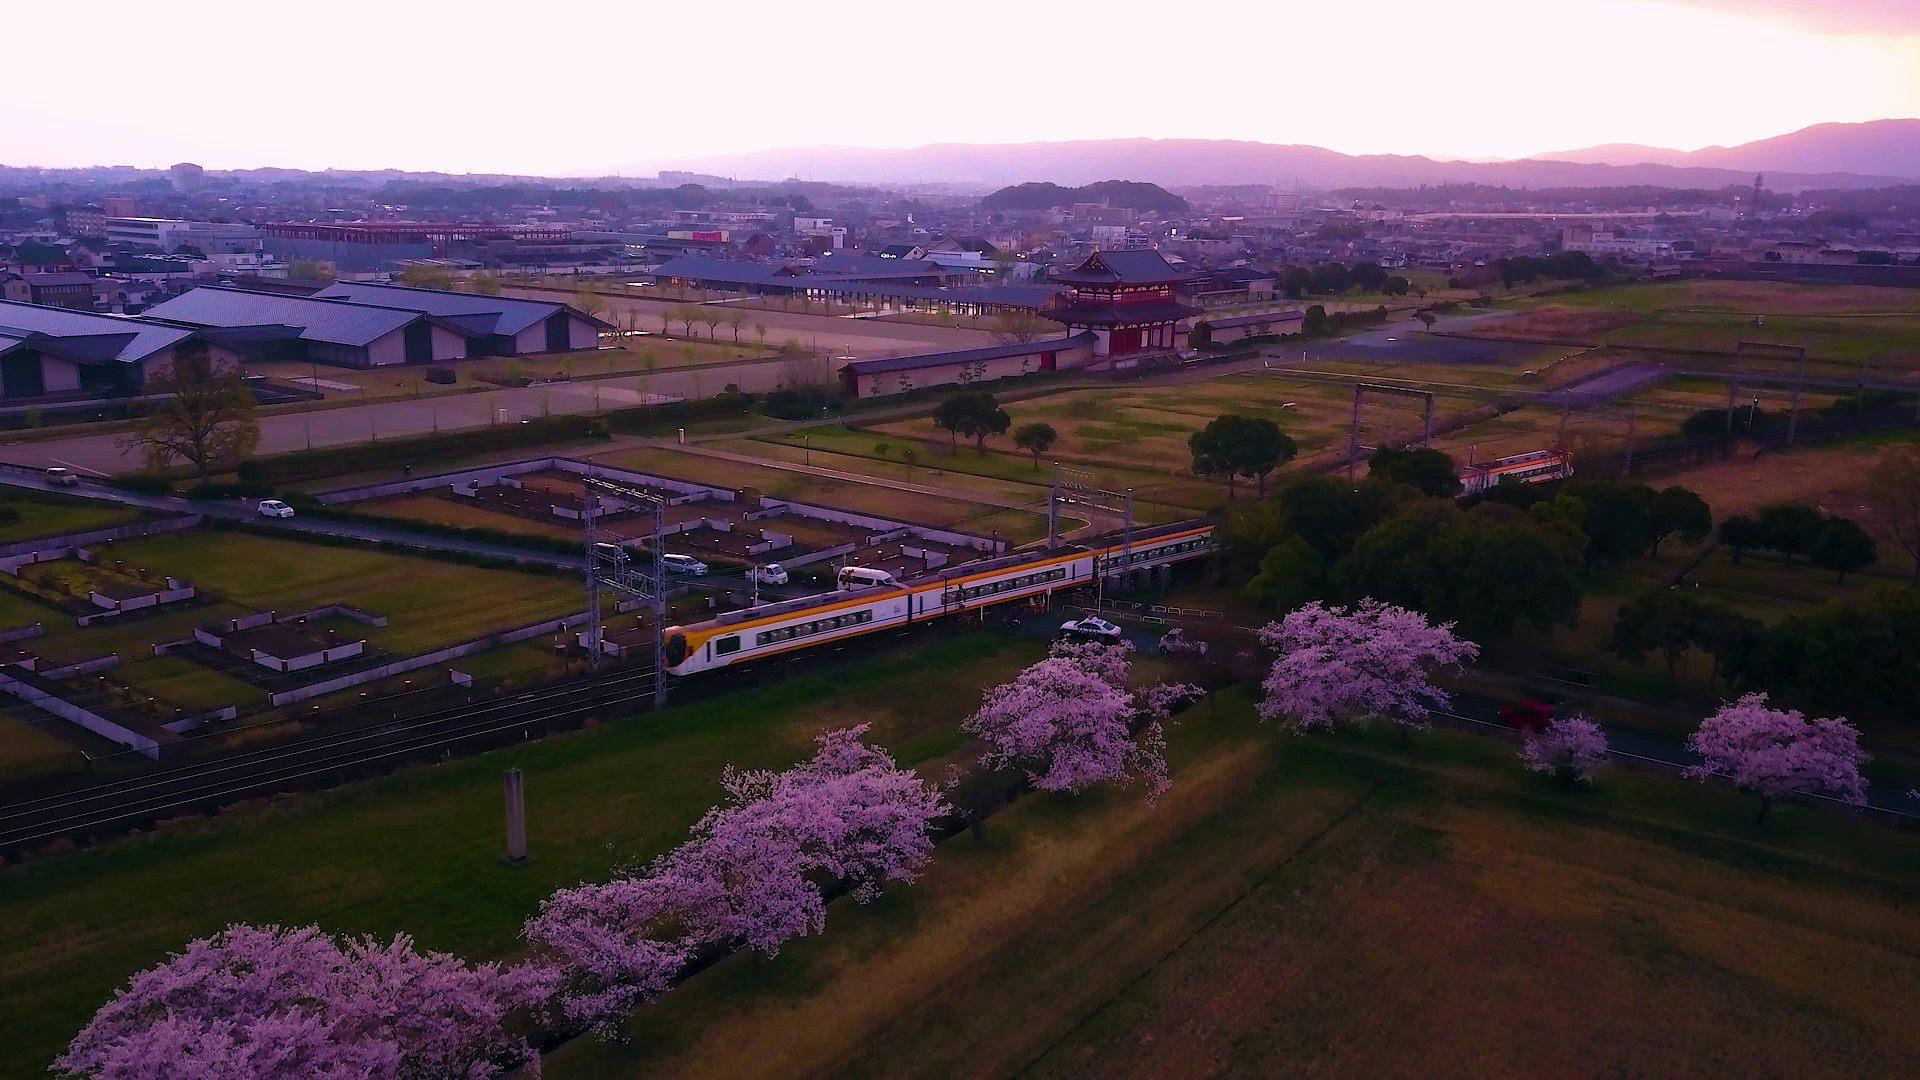 Kintetsu trains are seen running through Nara in the spring.